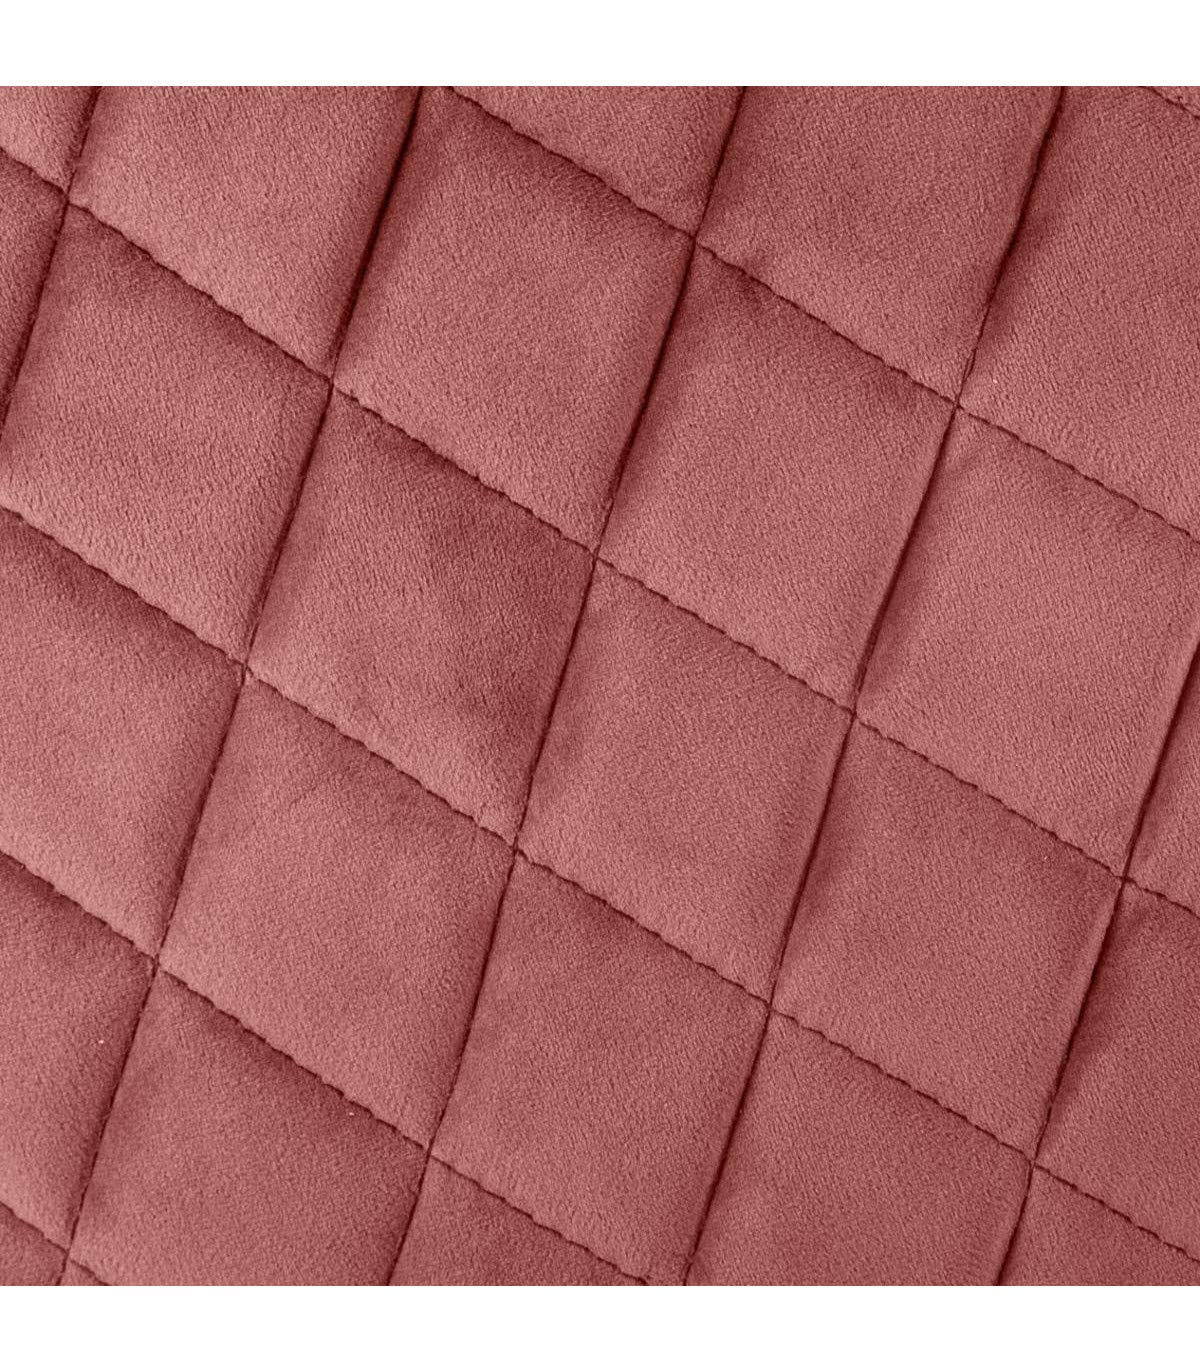 Chaise Fauteuil en Velours Rose Blush Marlo Atmosphera